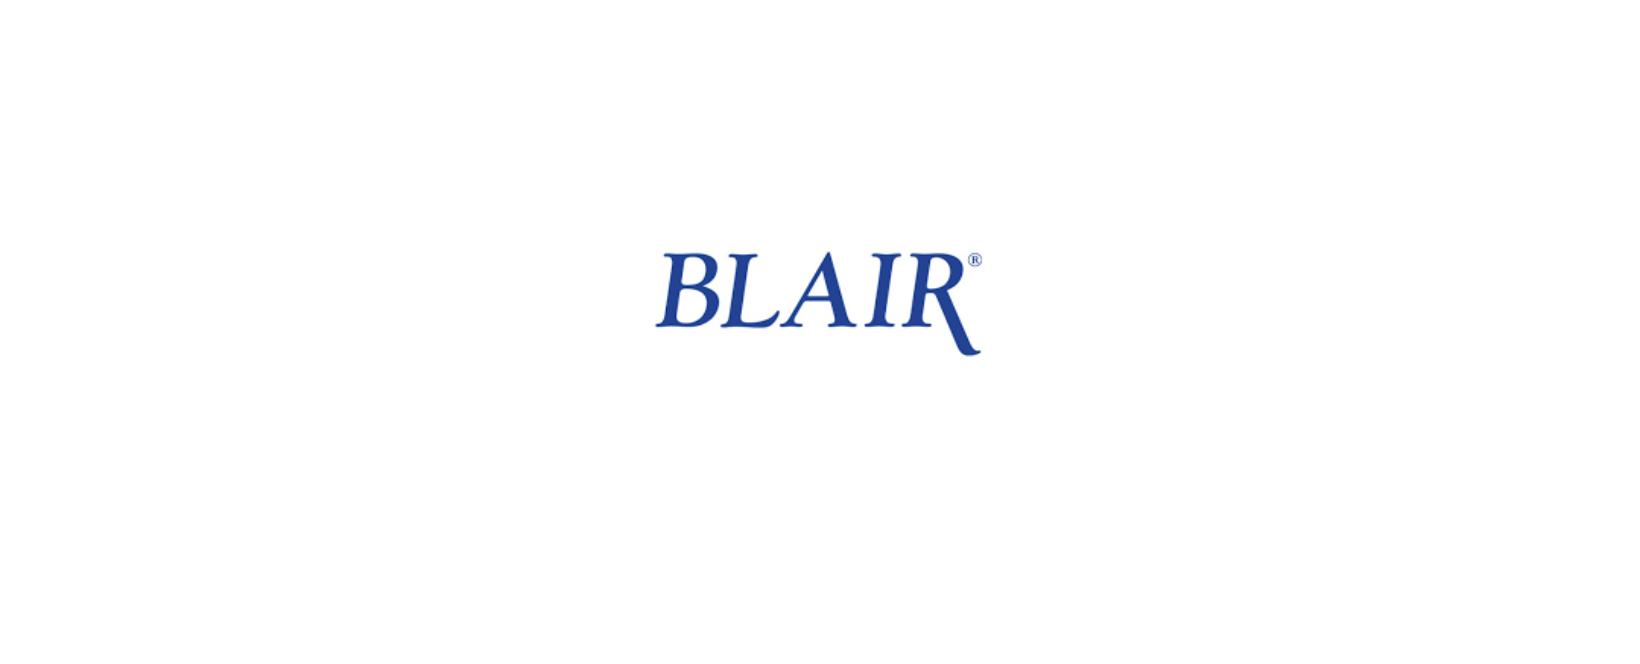 Blair Discount Code 2021